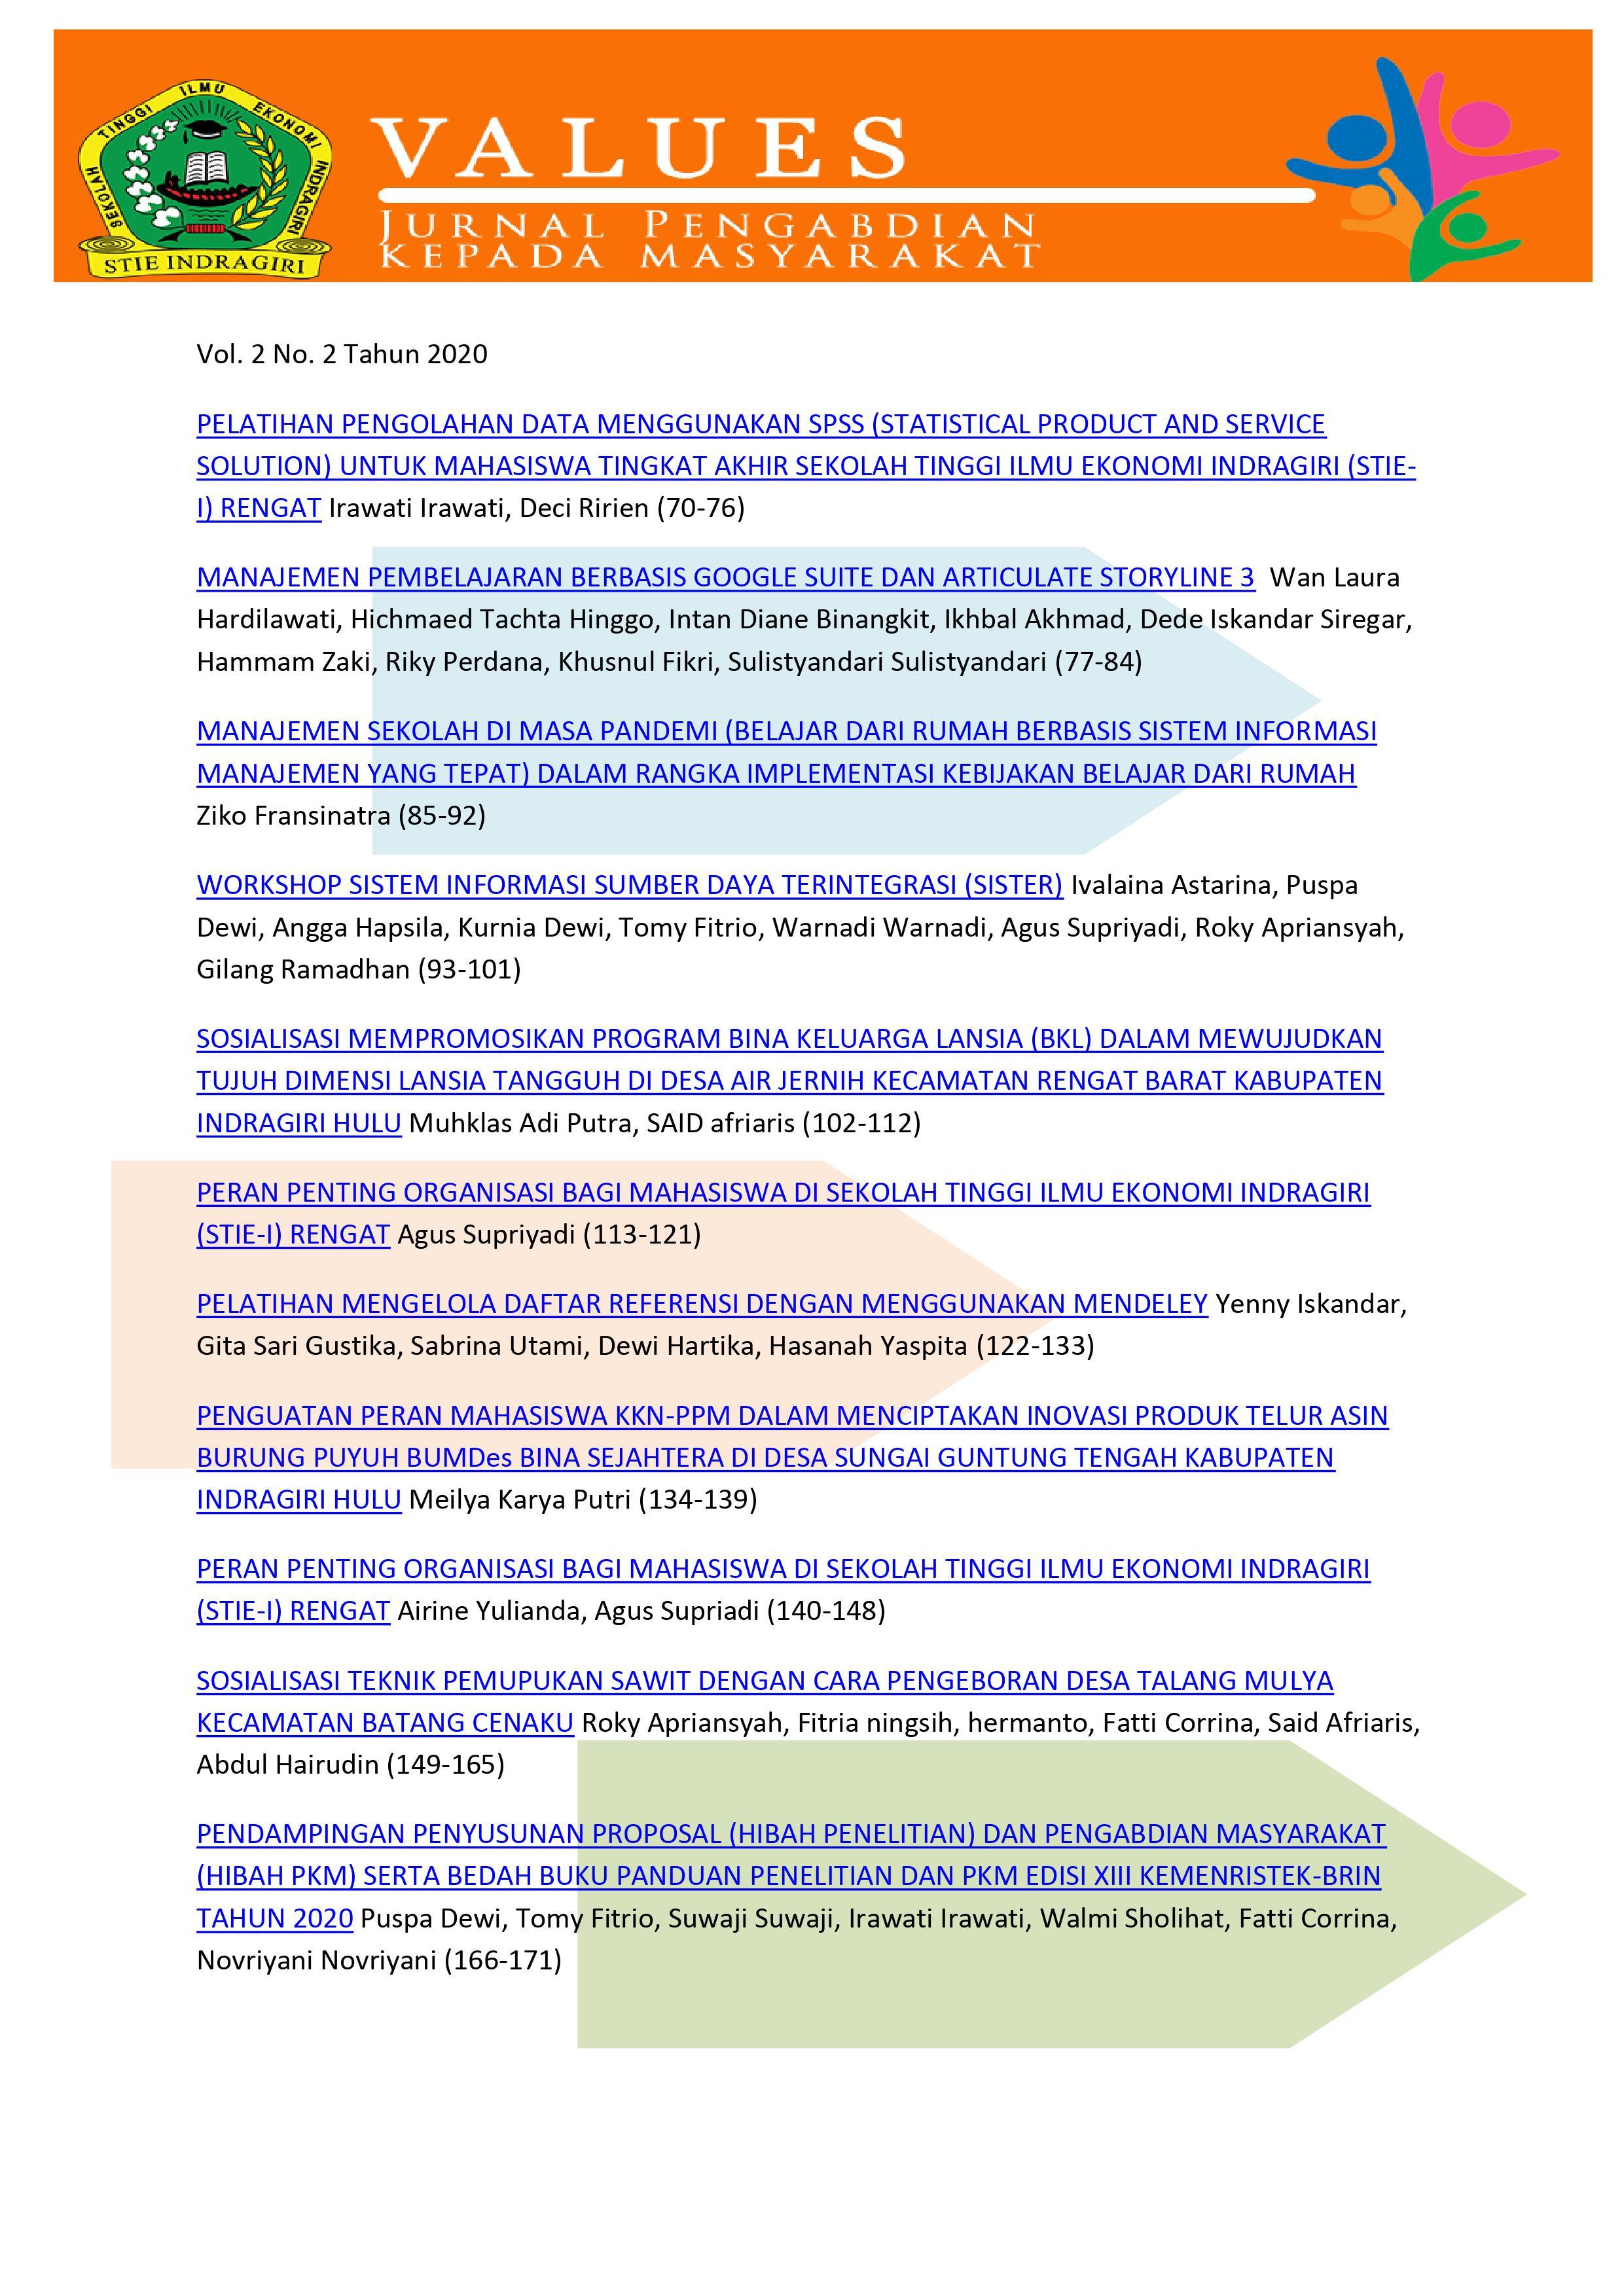 View Vol. 2 No. 2 (2020): VALUES: Jurnal Pengabdian Kepada Masyarakat